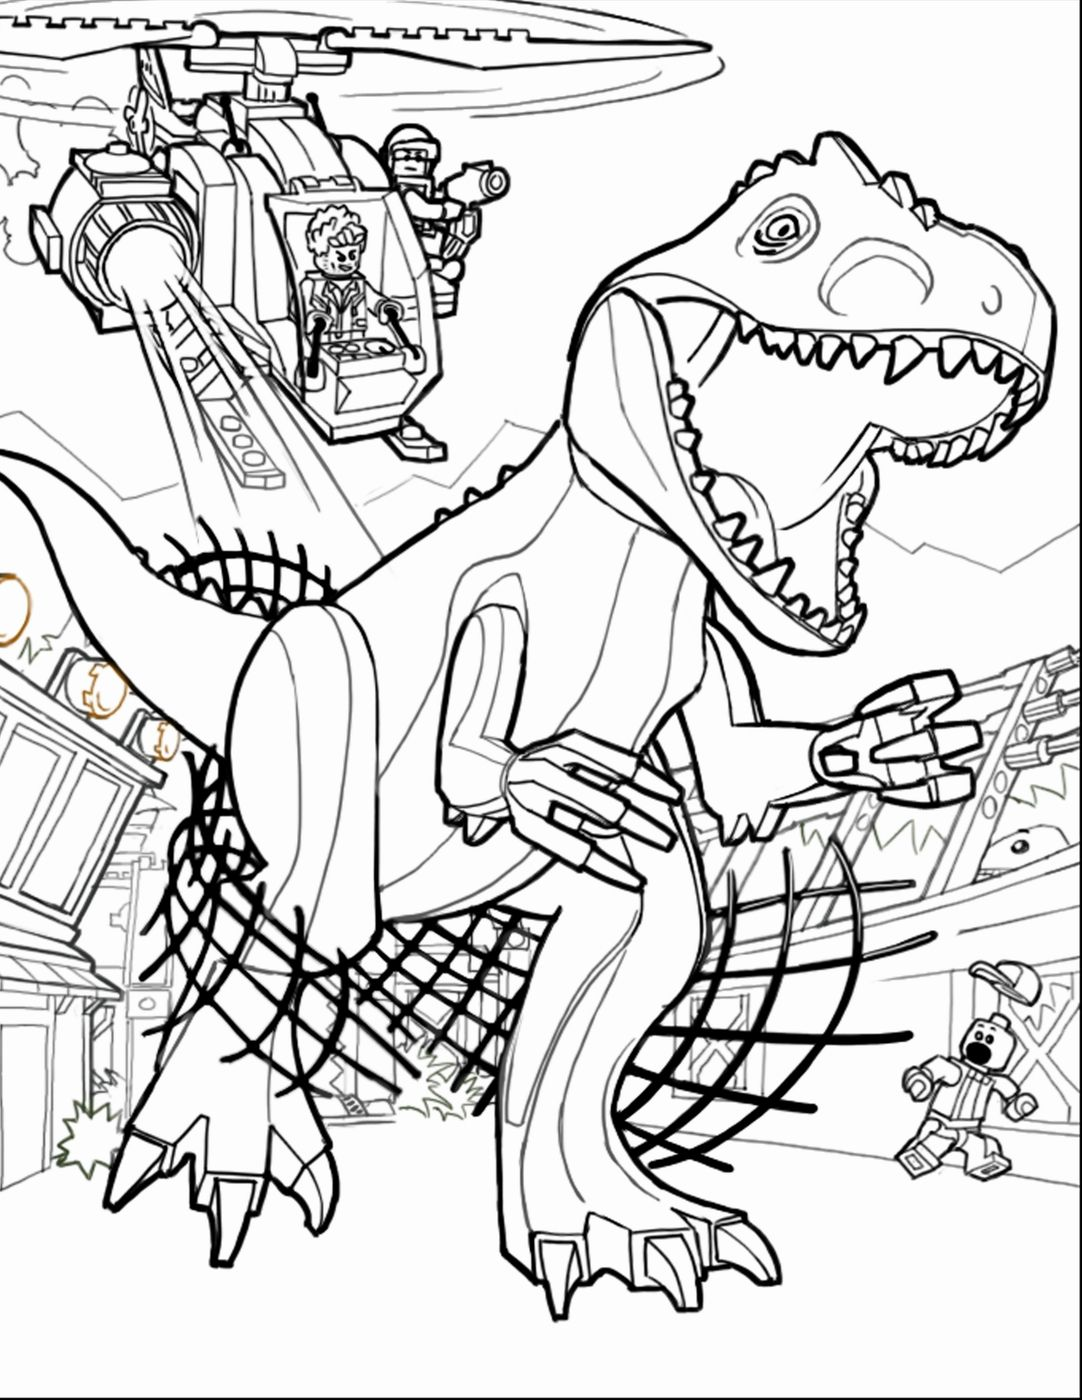 Jurassic World Malvorlagen Pdf – tiffanylovesbooks.com